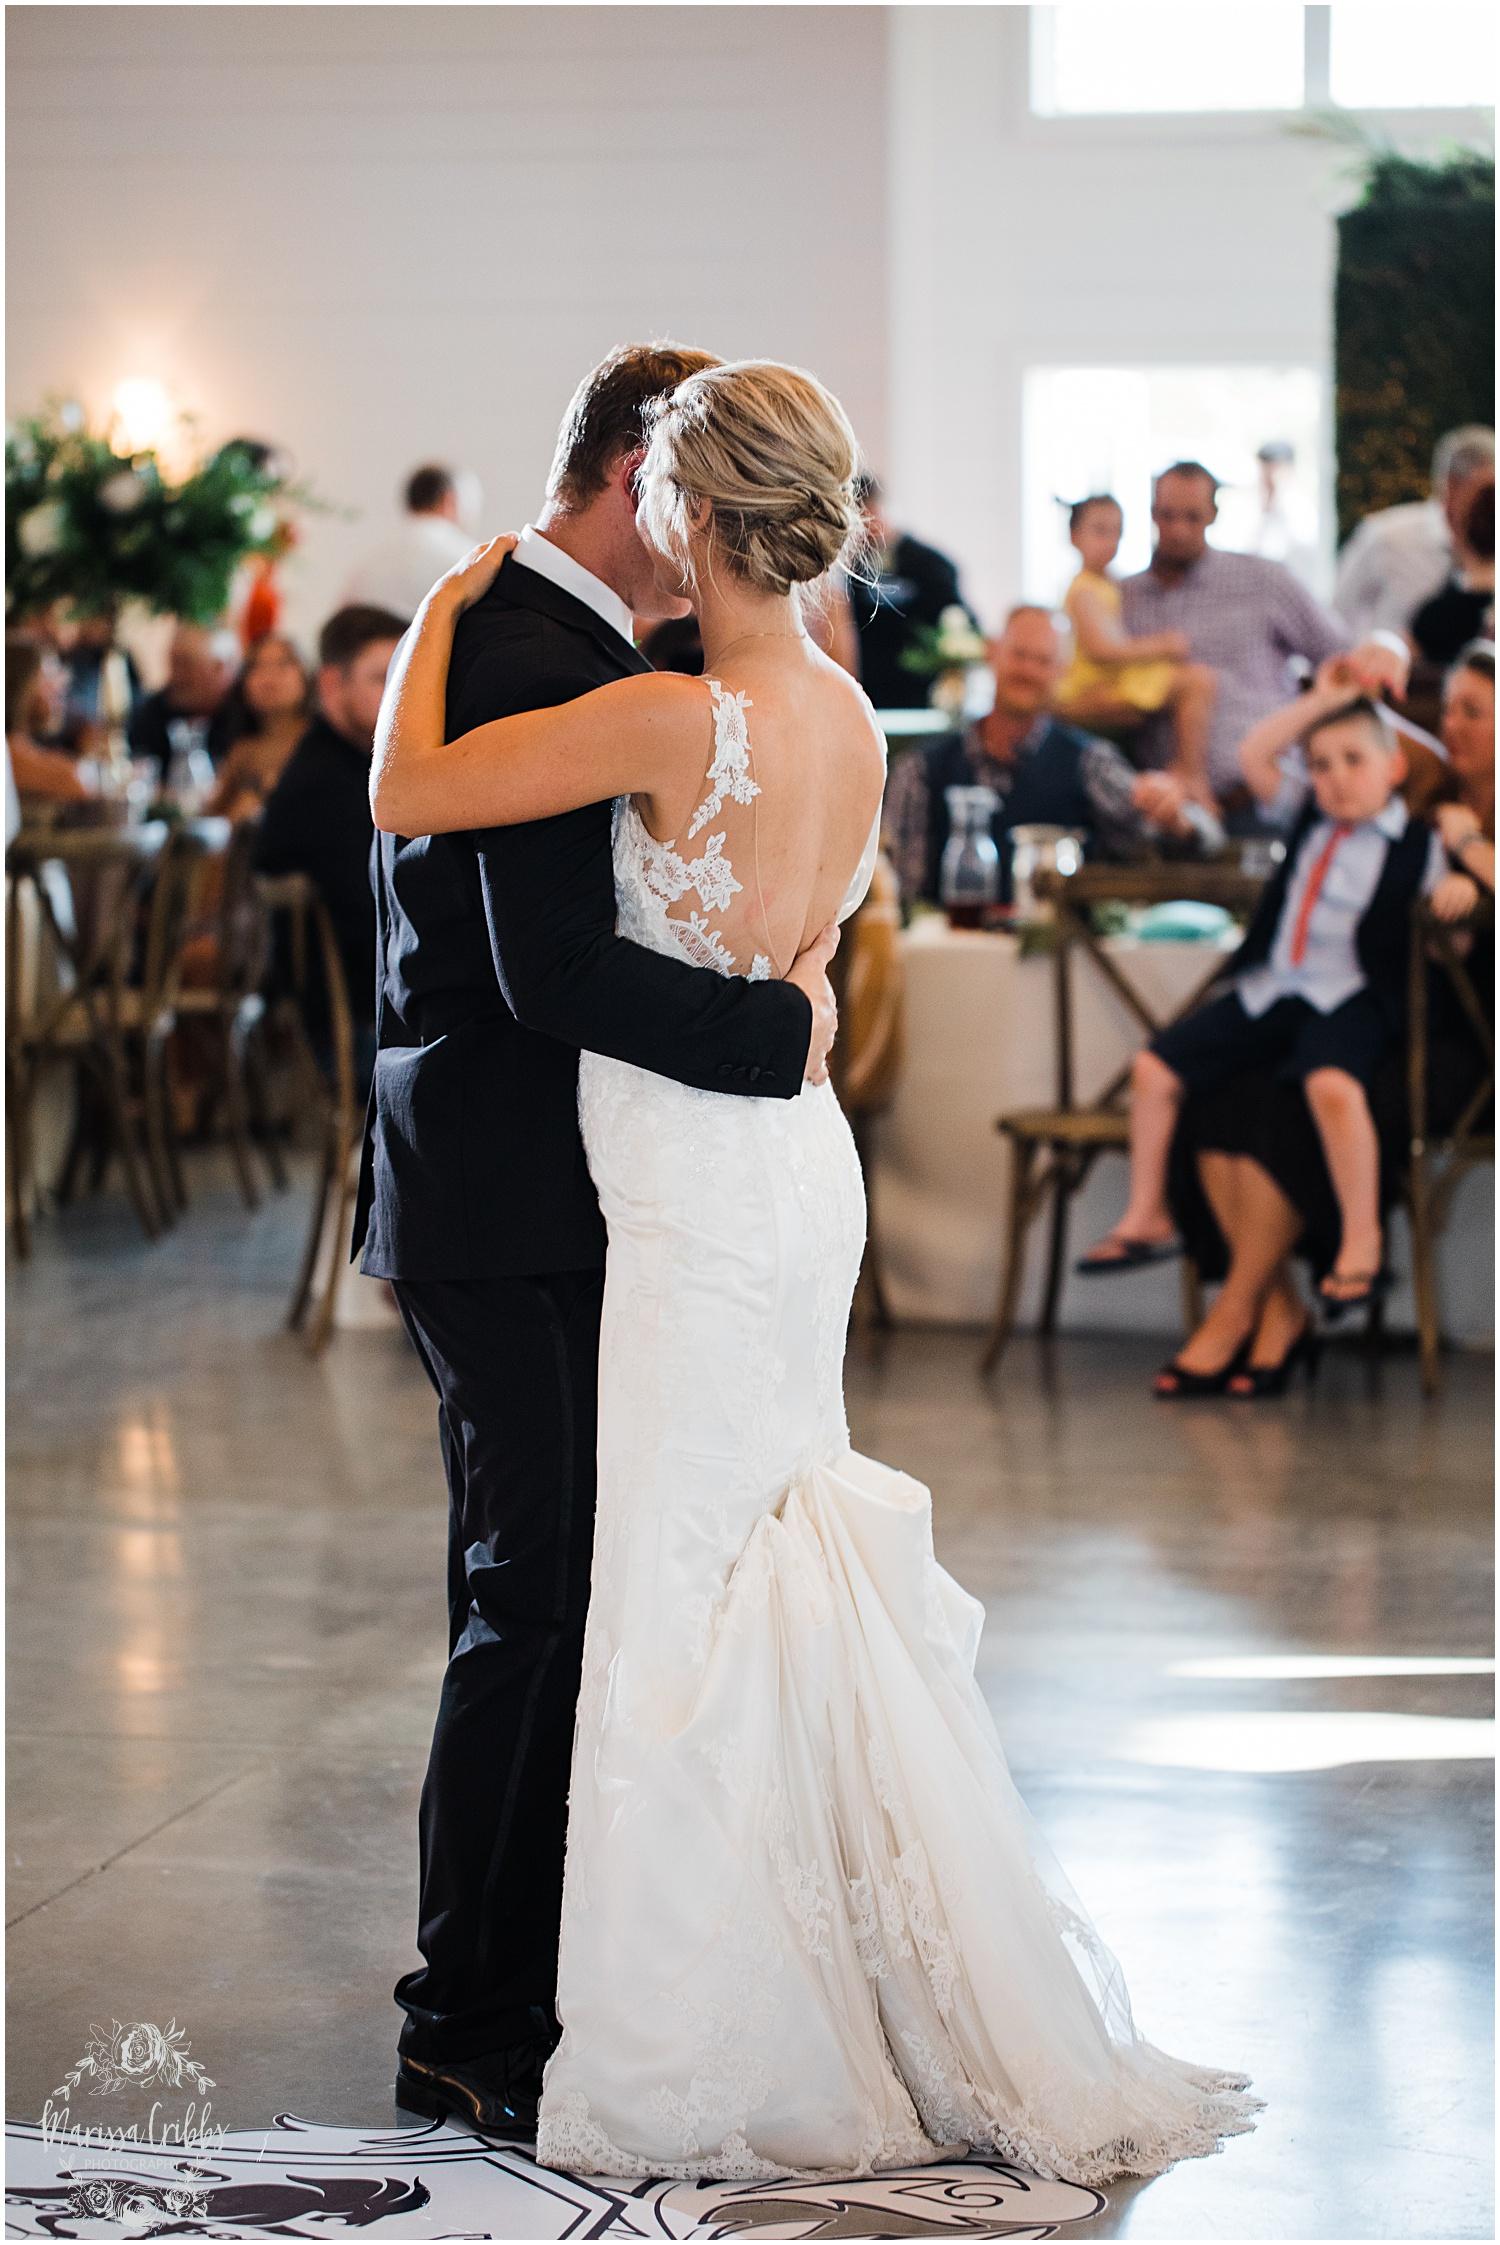 CHELSEA & BEN MARRIED BLOG  | MARISSA CRIBBS PHOTOGRAPHY_8612.jpg